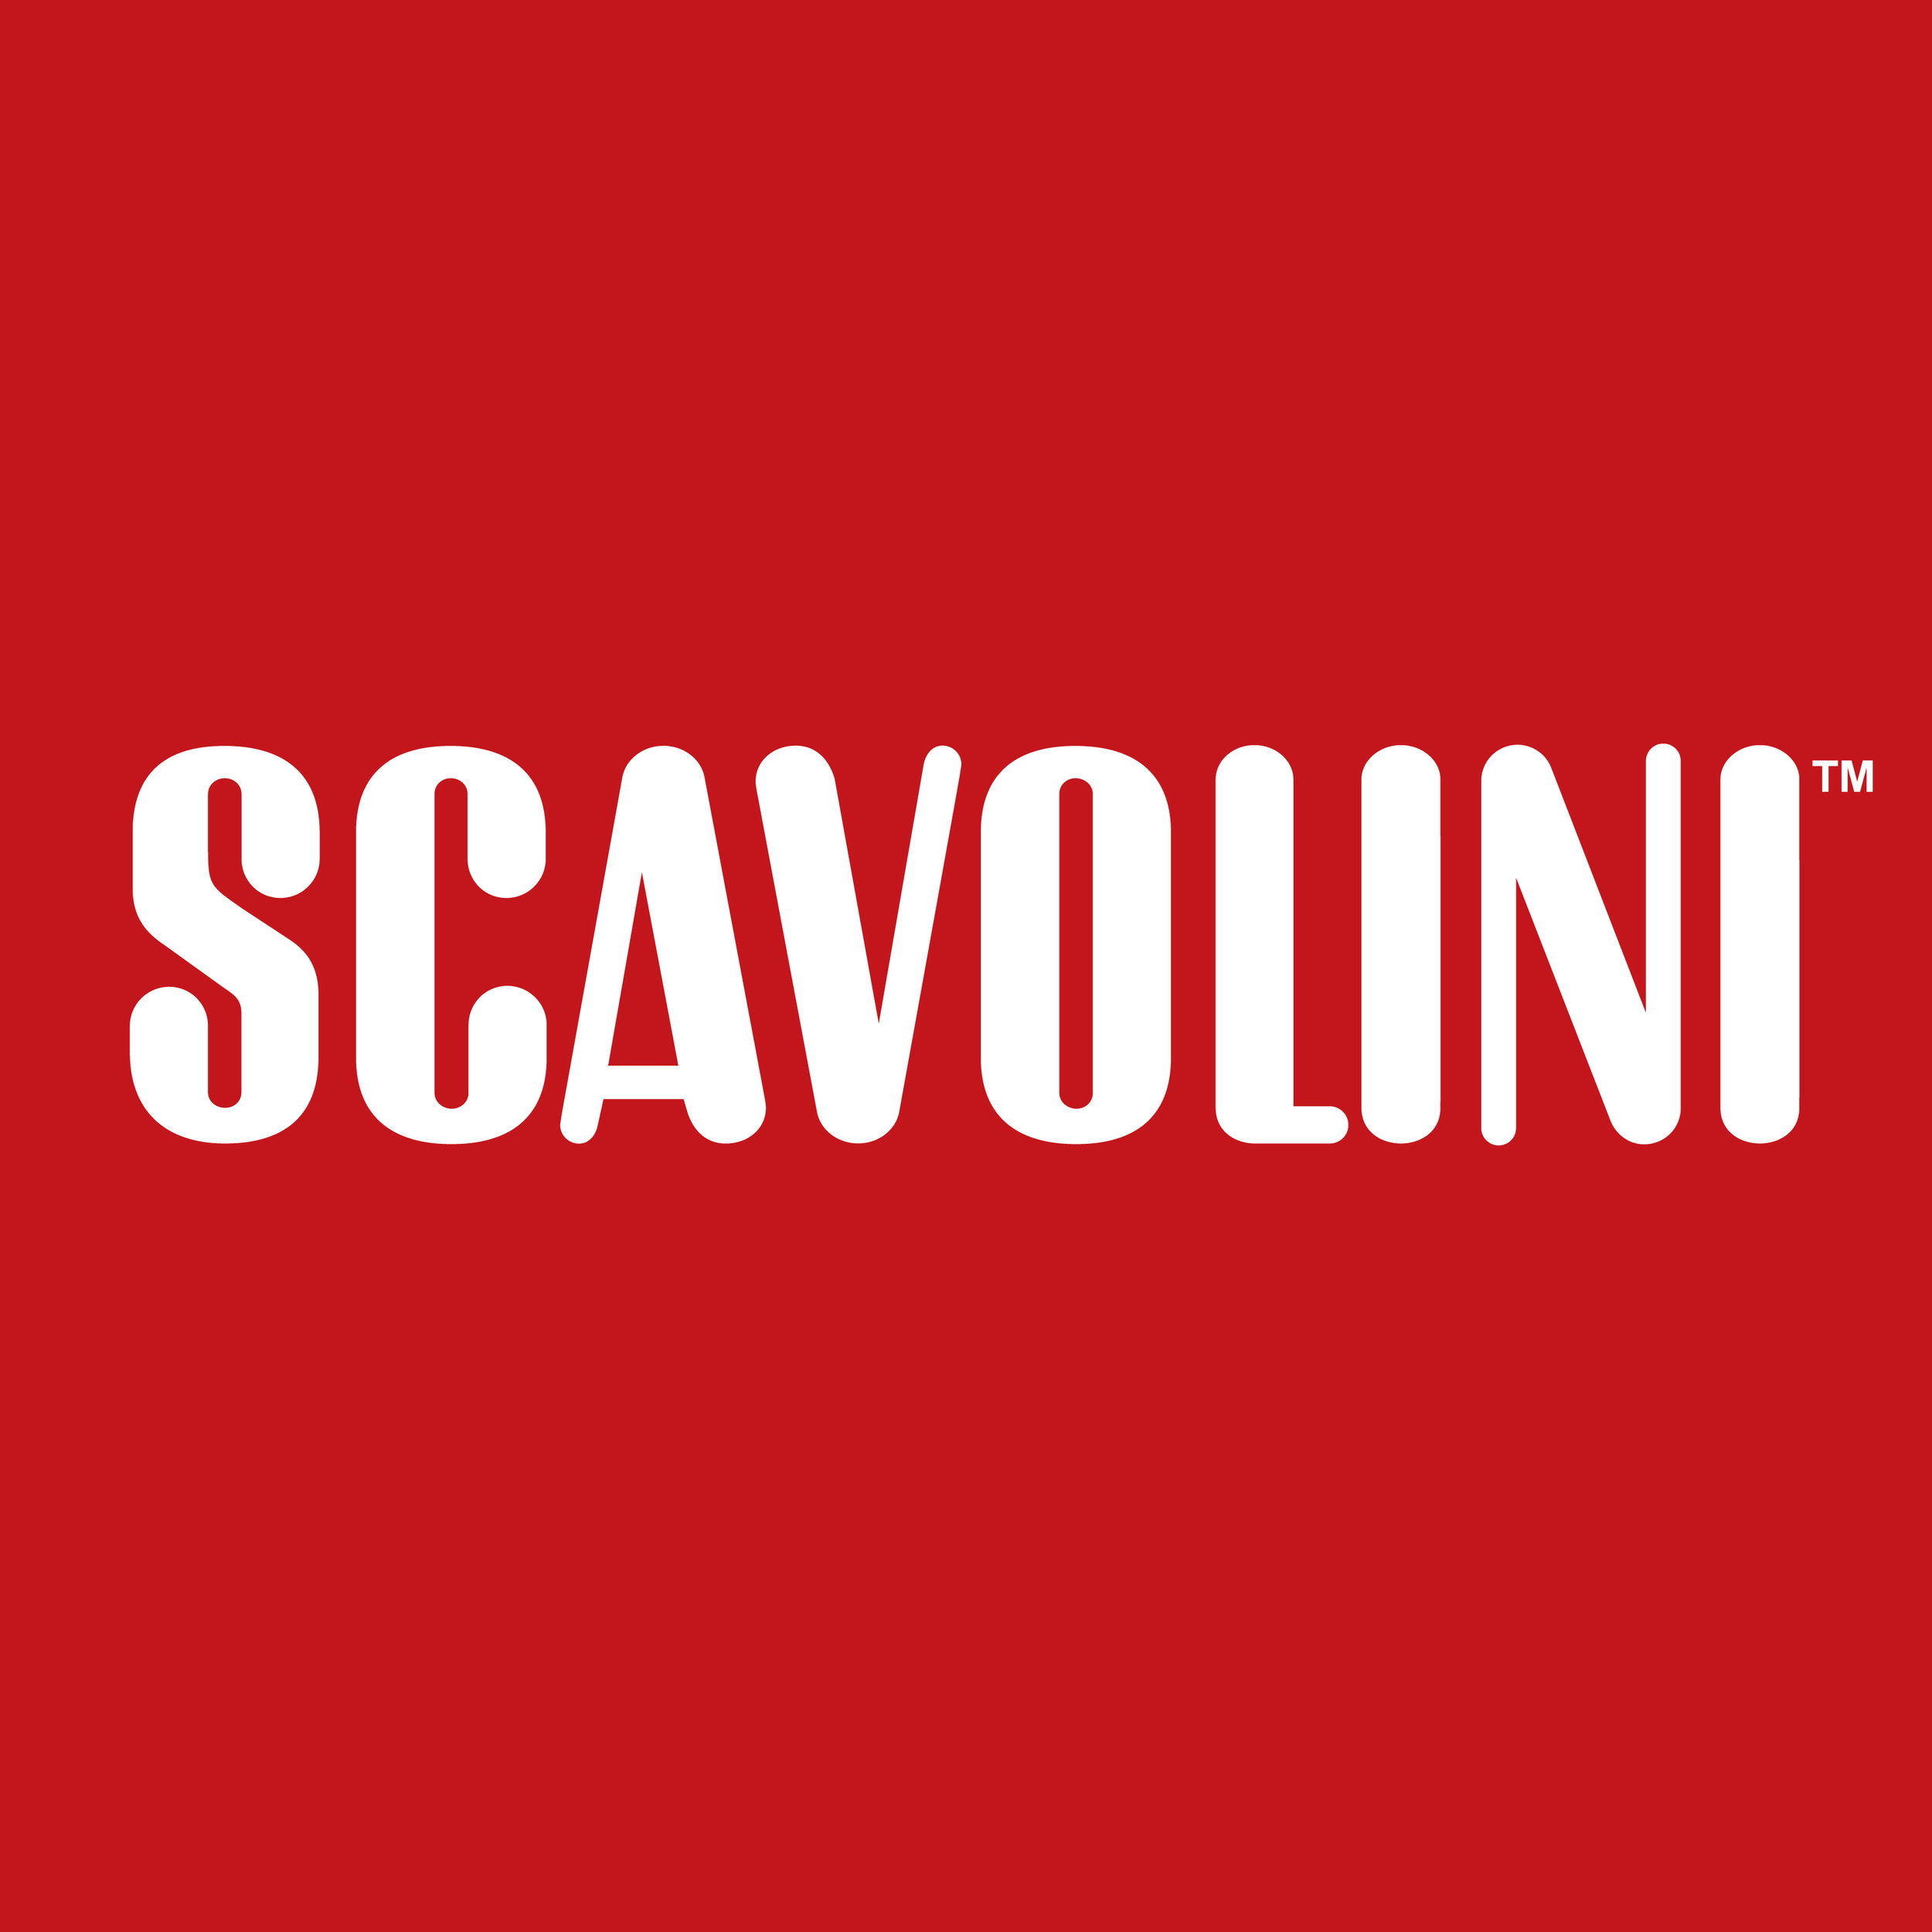 scavolioni-01.jpg